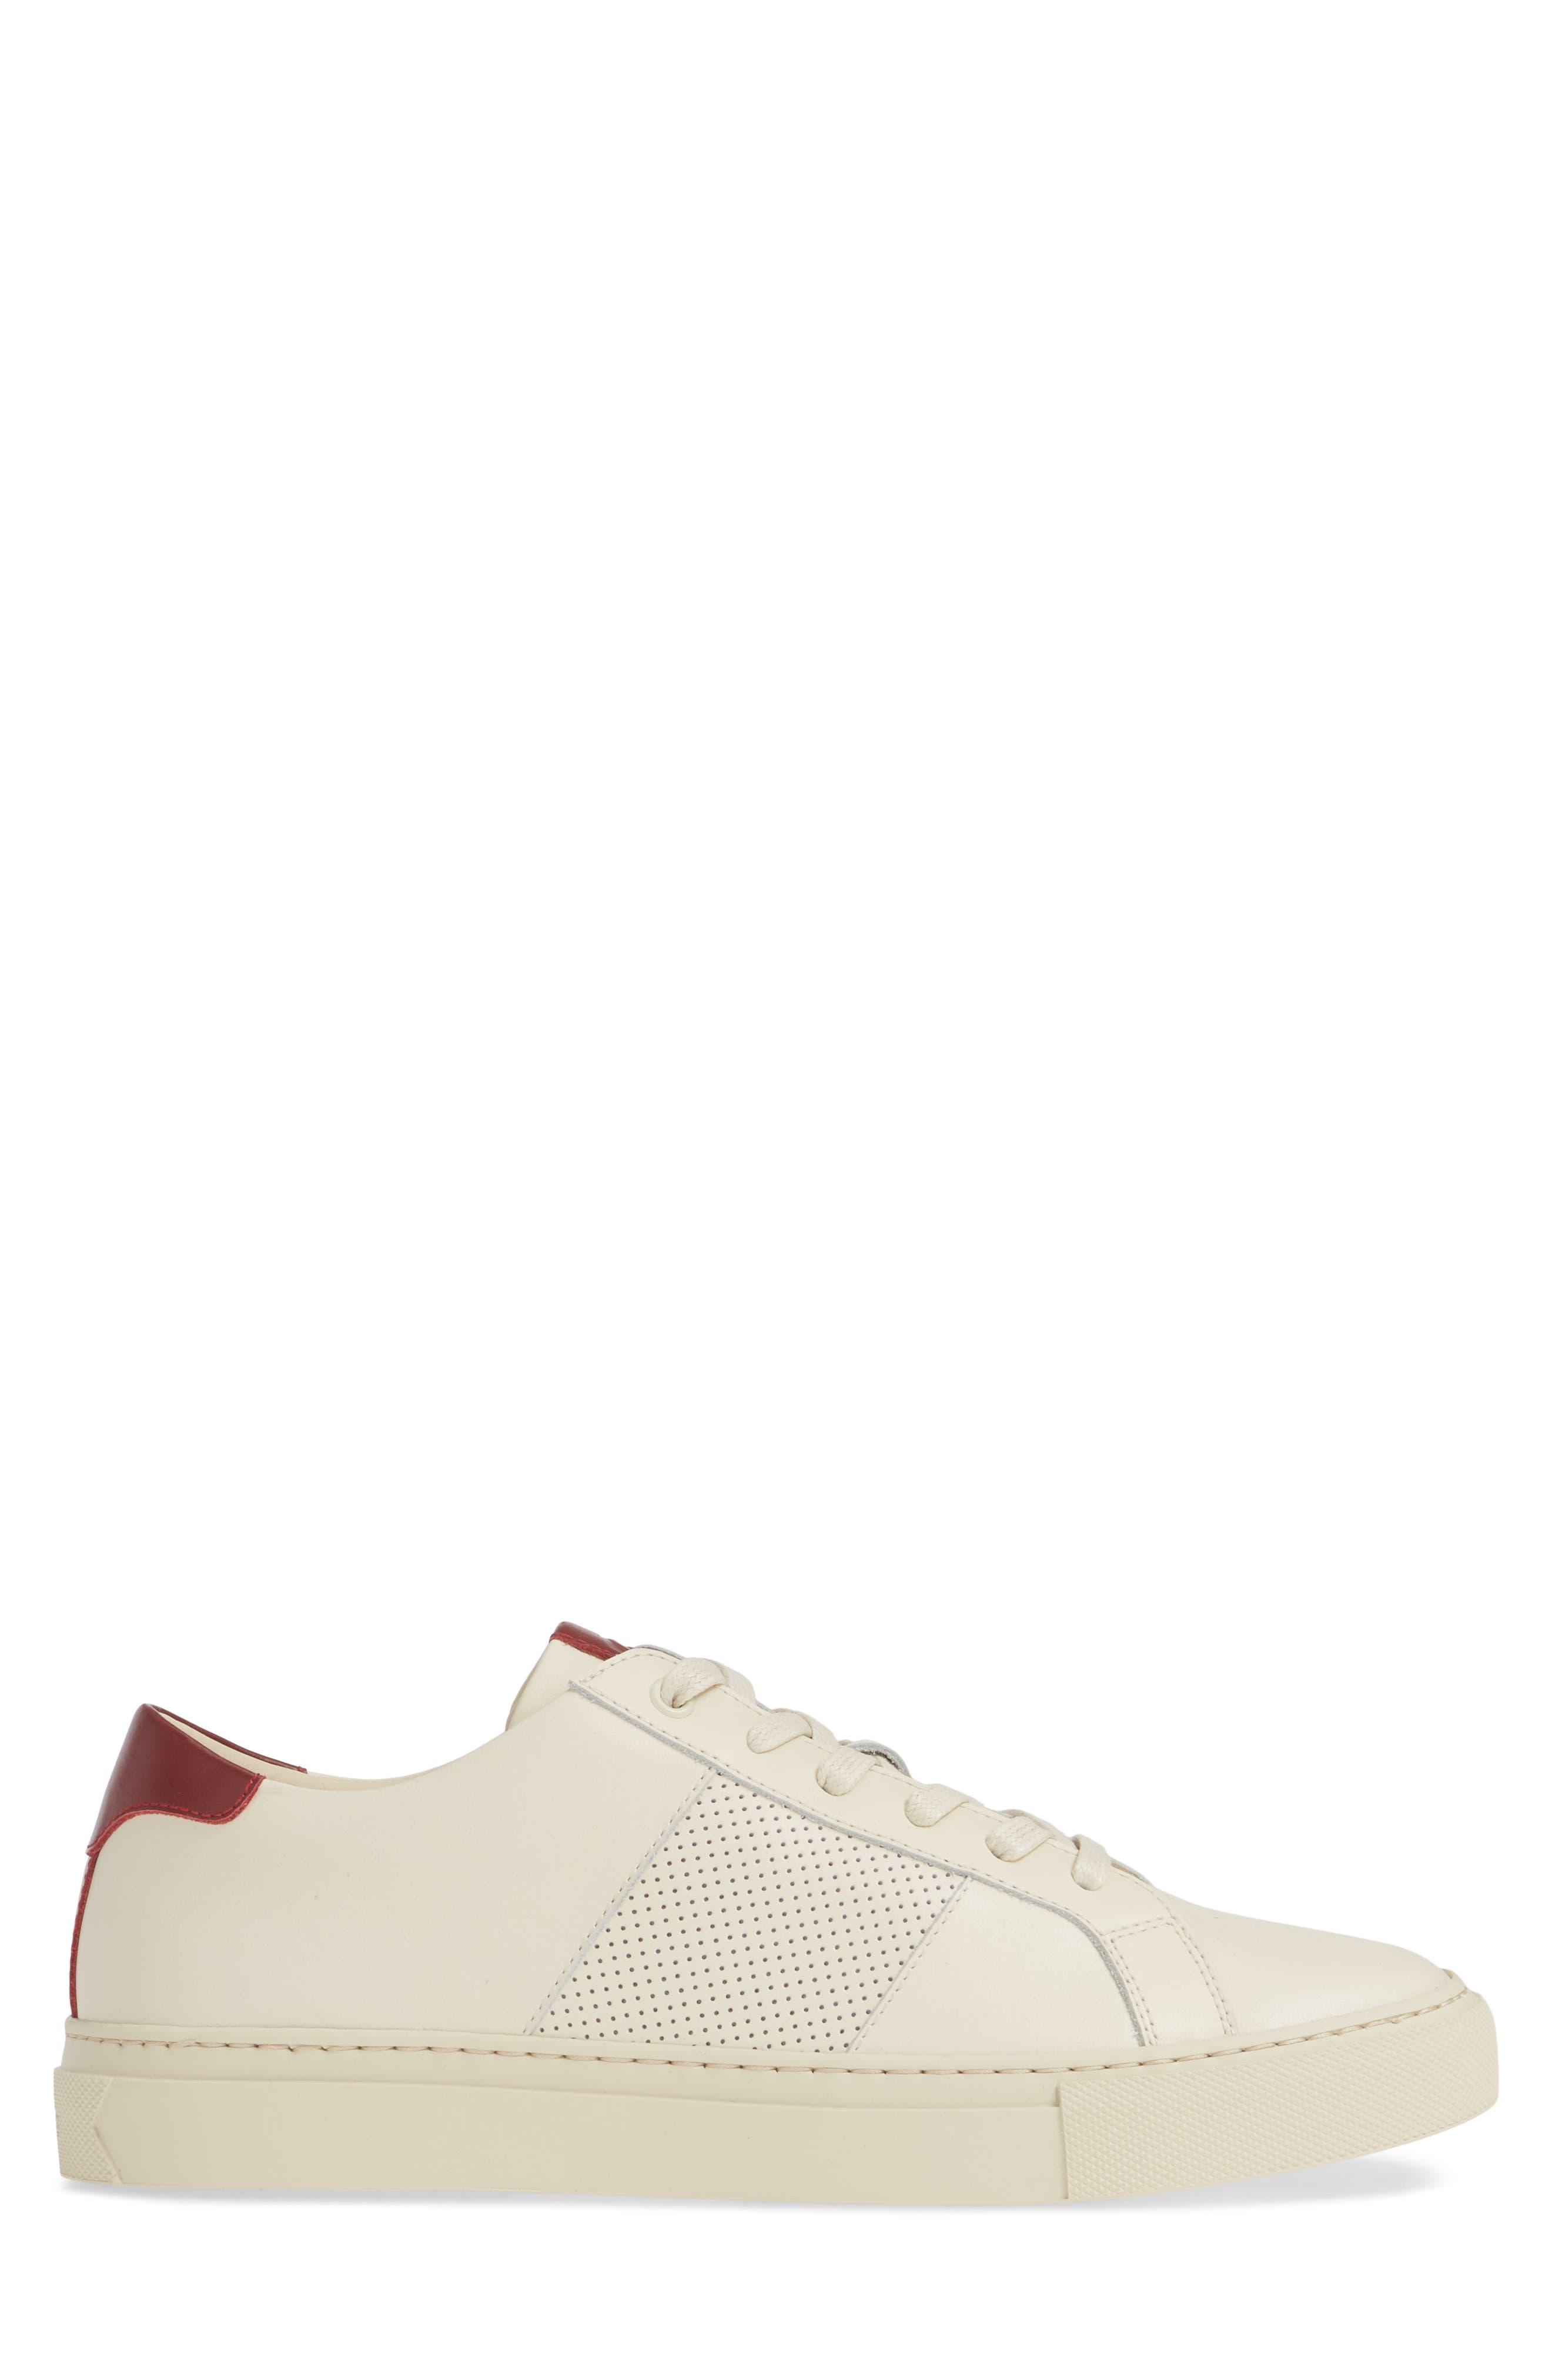 GREATS, Royale Sneaker, Alternate thumbnail 3, color, 112